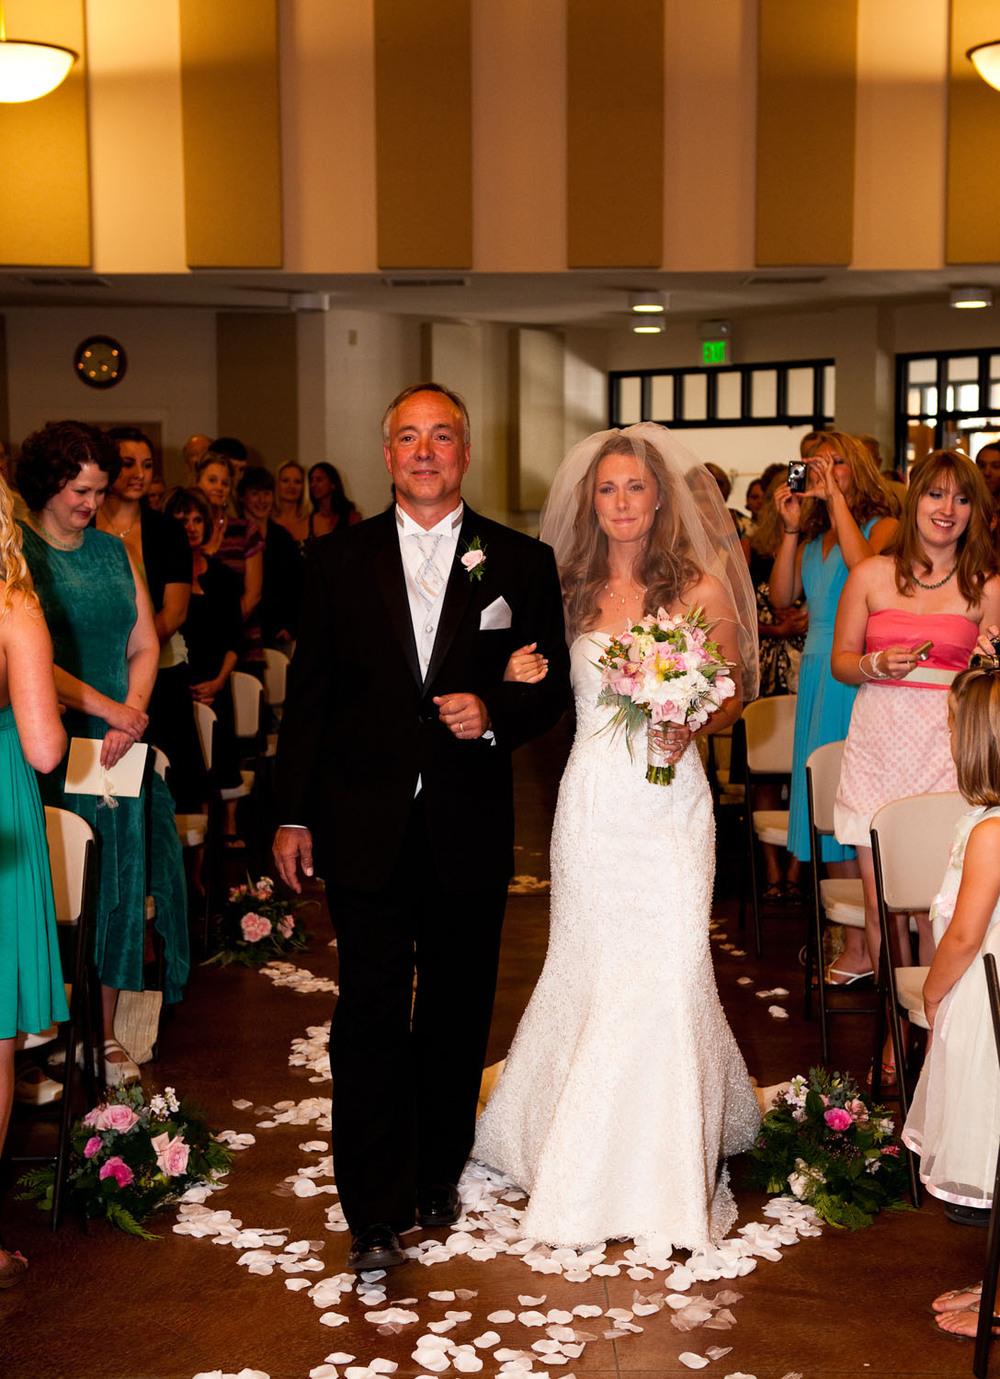 stewart_bertrand_weddings_whp1-1046.jpg